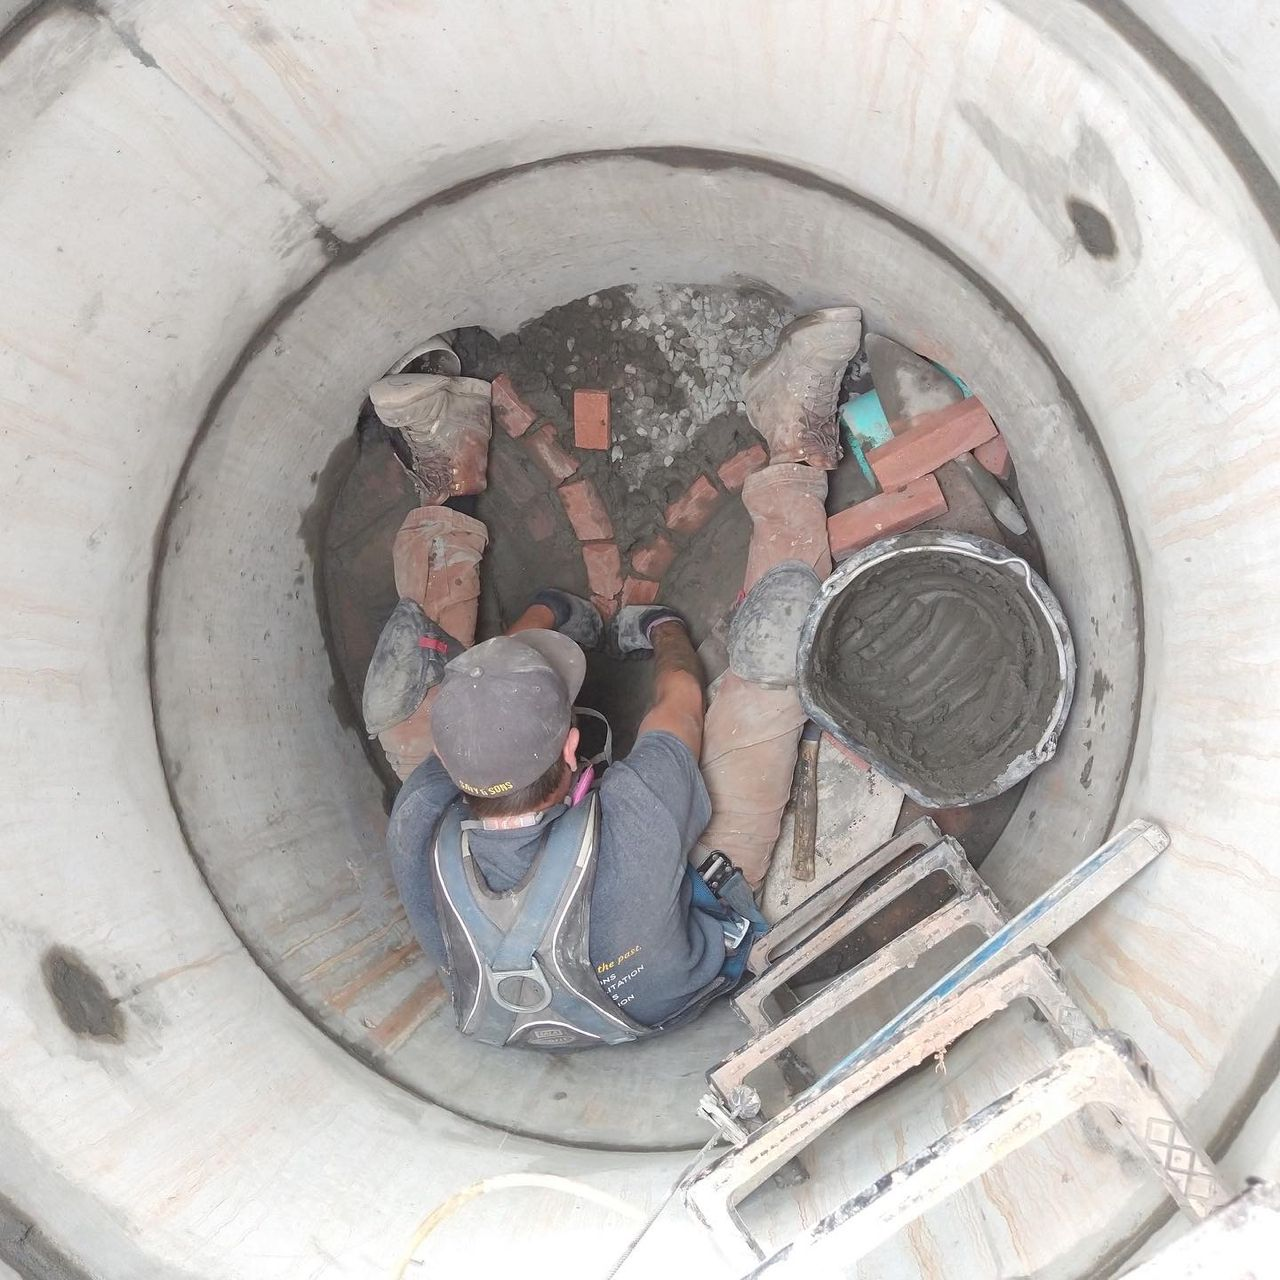 manhole-restoration-brick-by-brick-1